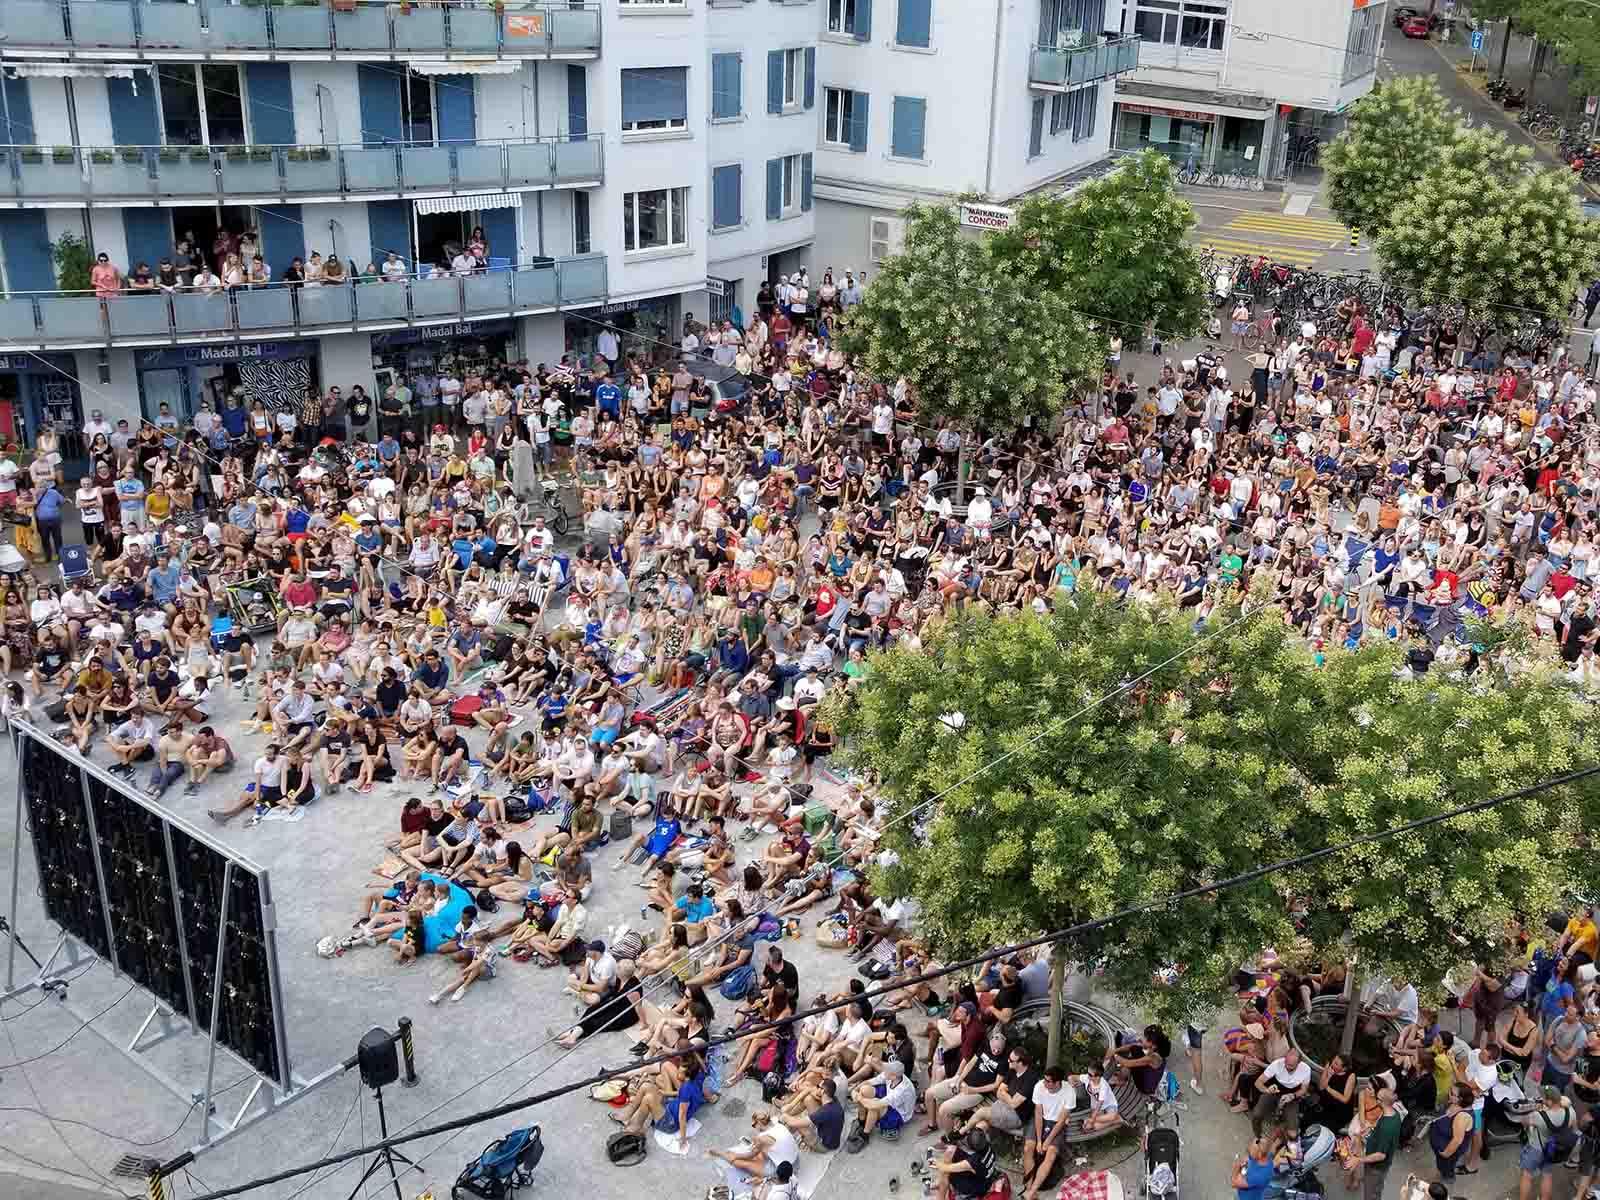 Public Viewing auf dem Röschibachplatz.